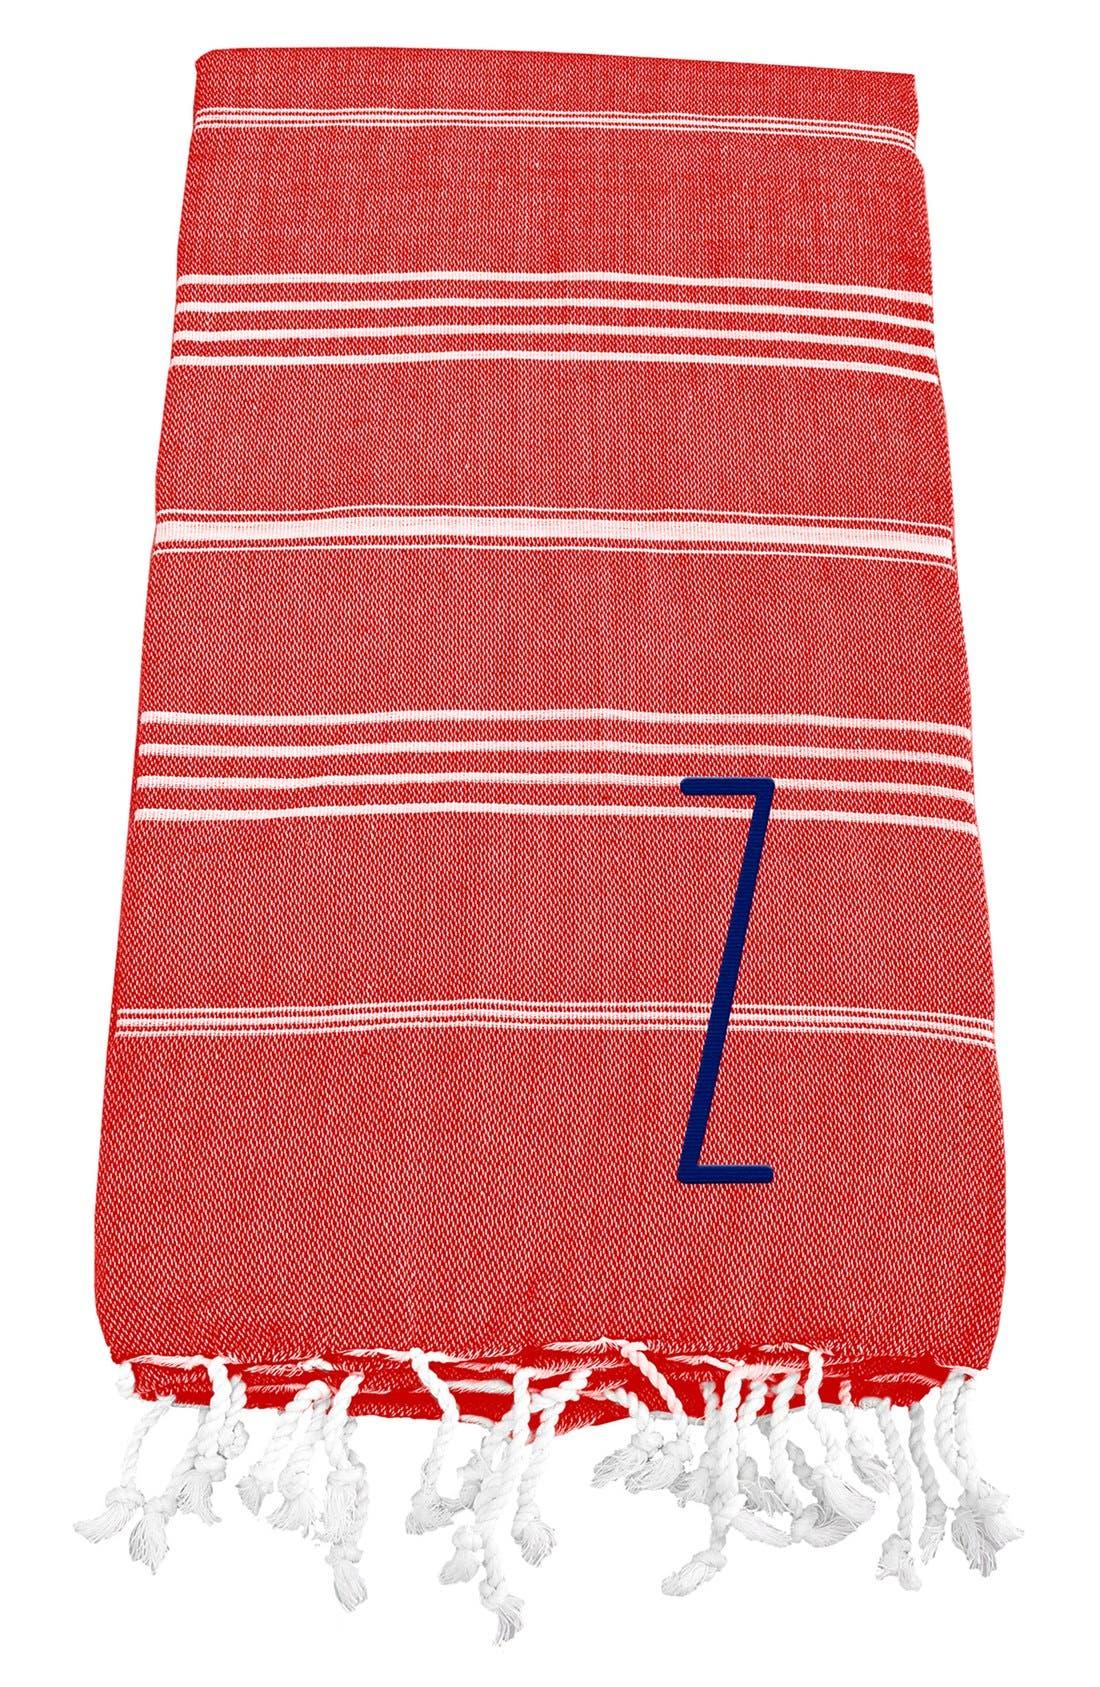 Monogram Turkish Cotton Towel,                             Main thumbnail 135, color,